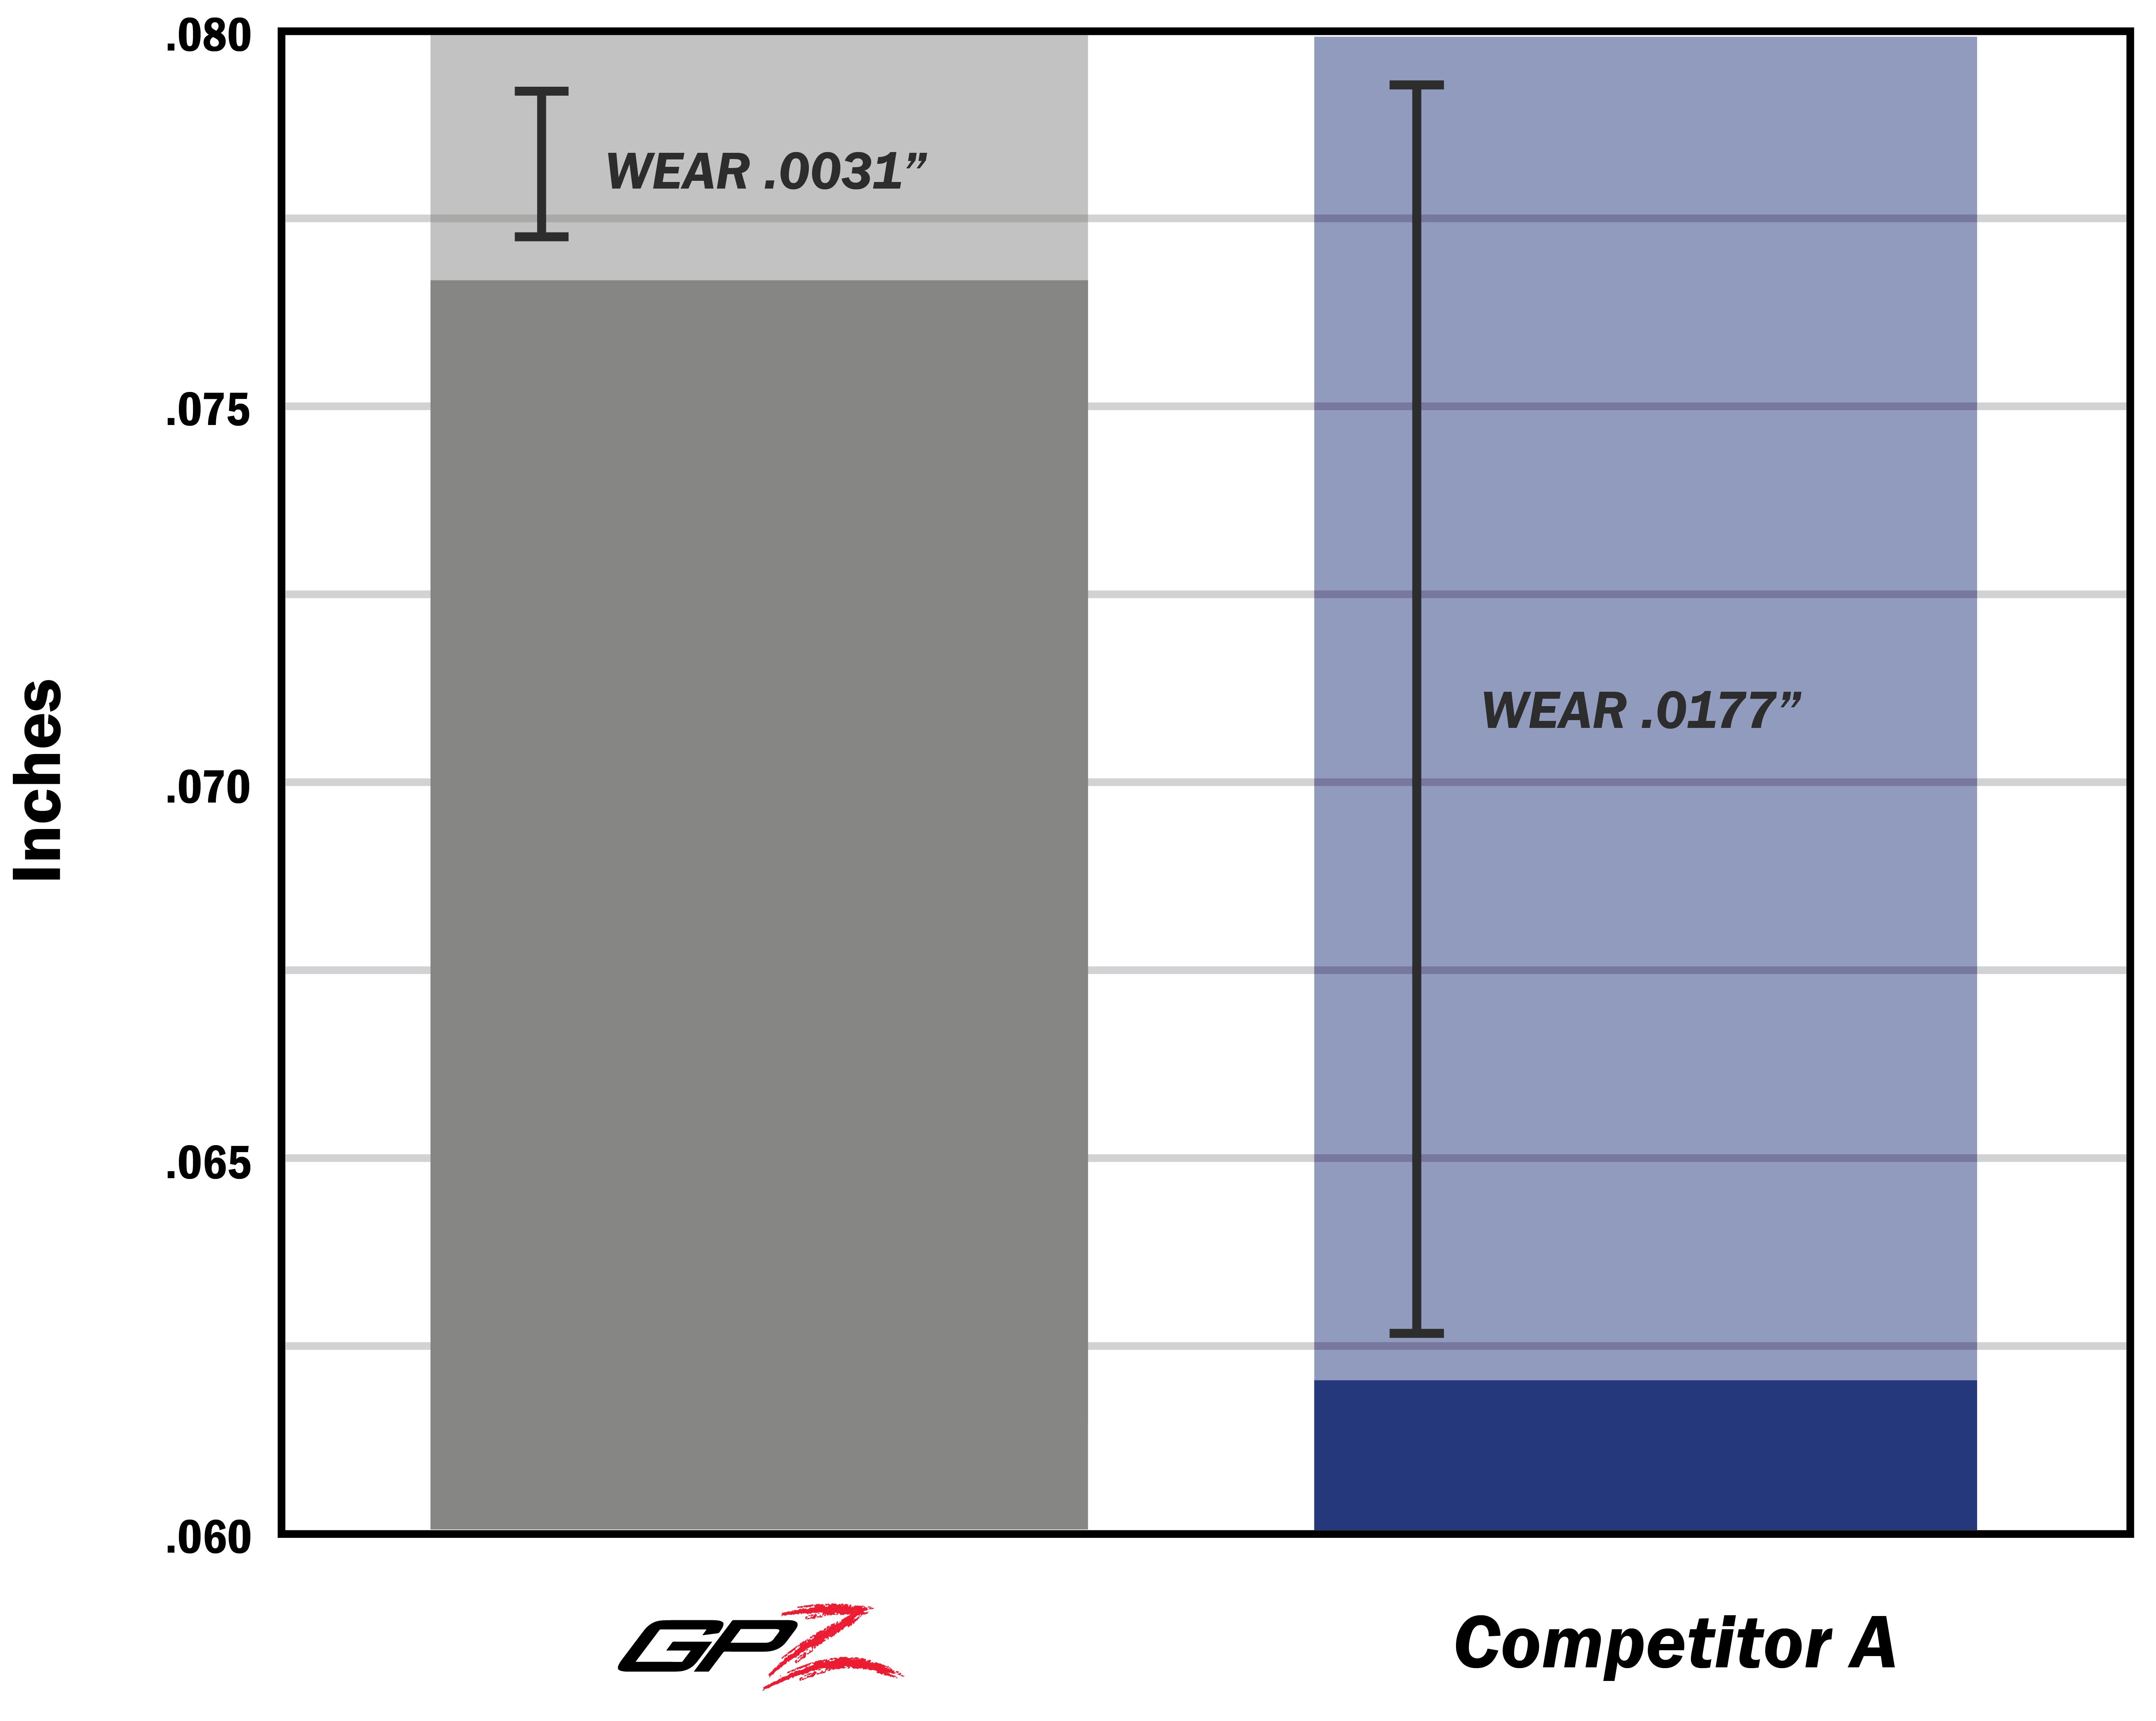 GPZ vs Competitor Material Wear